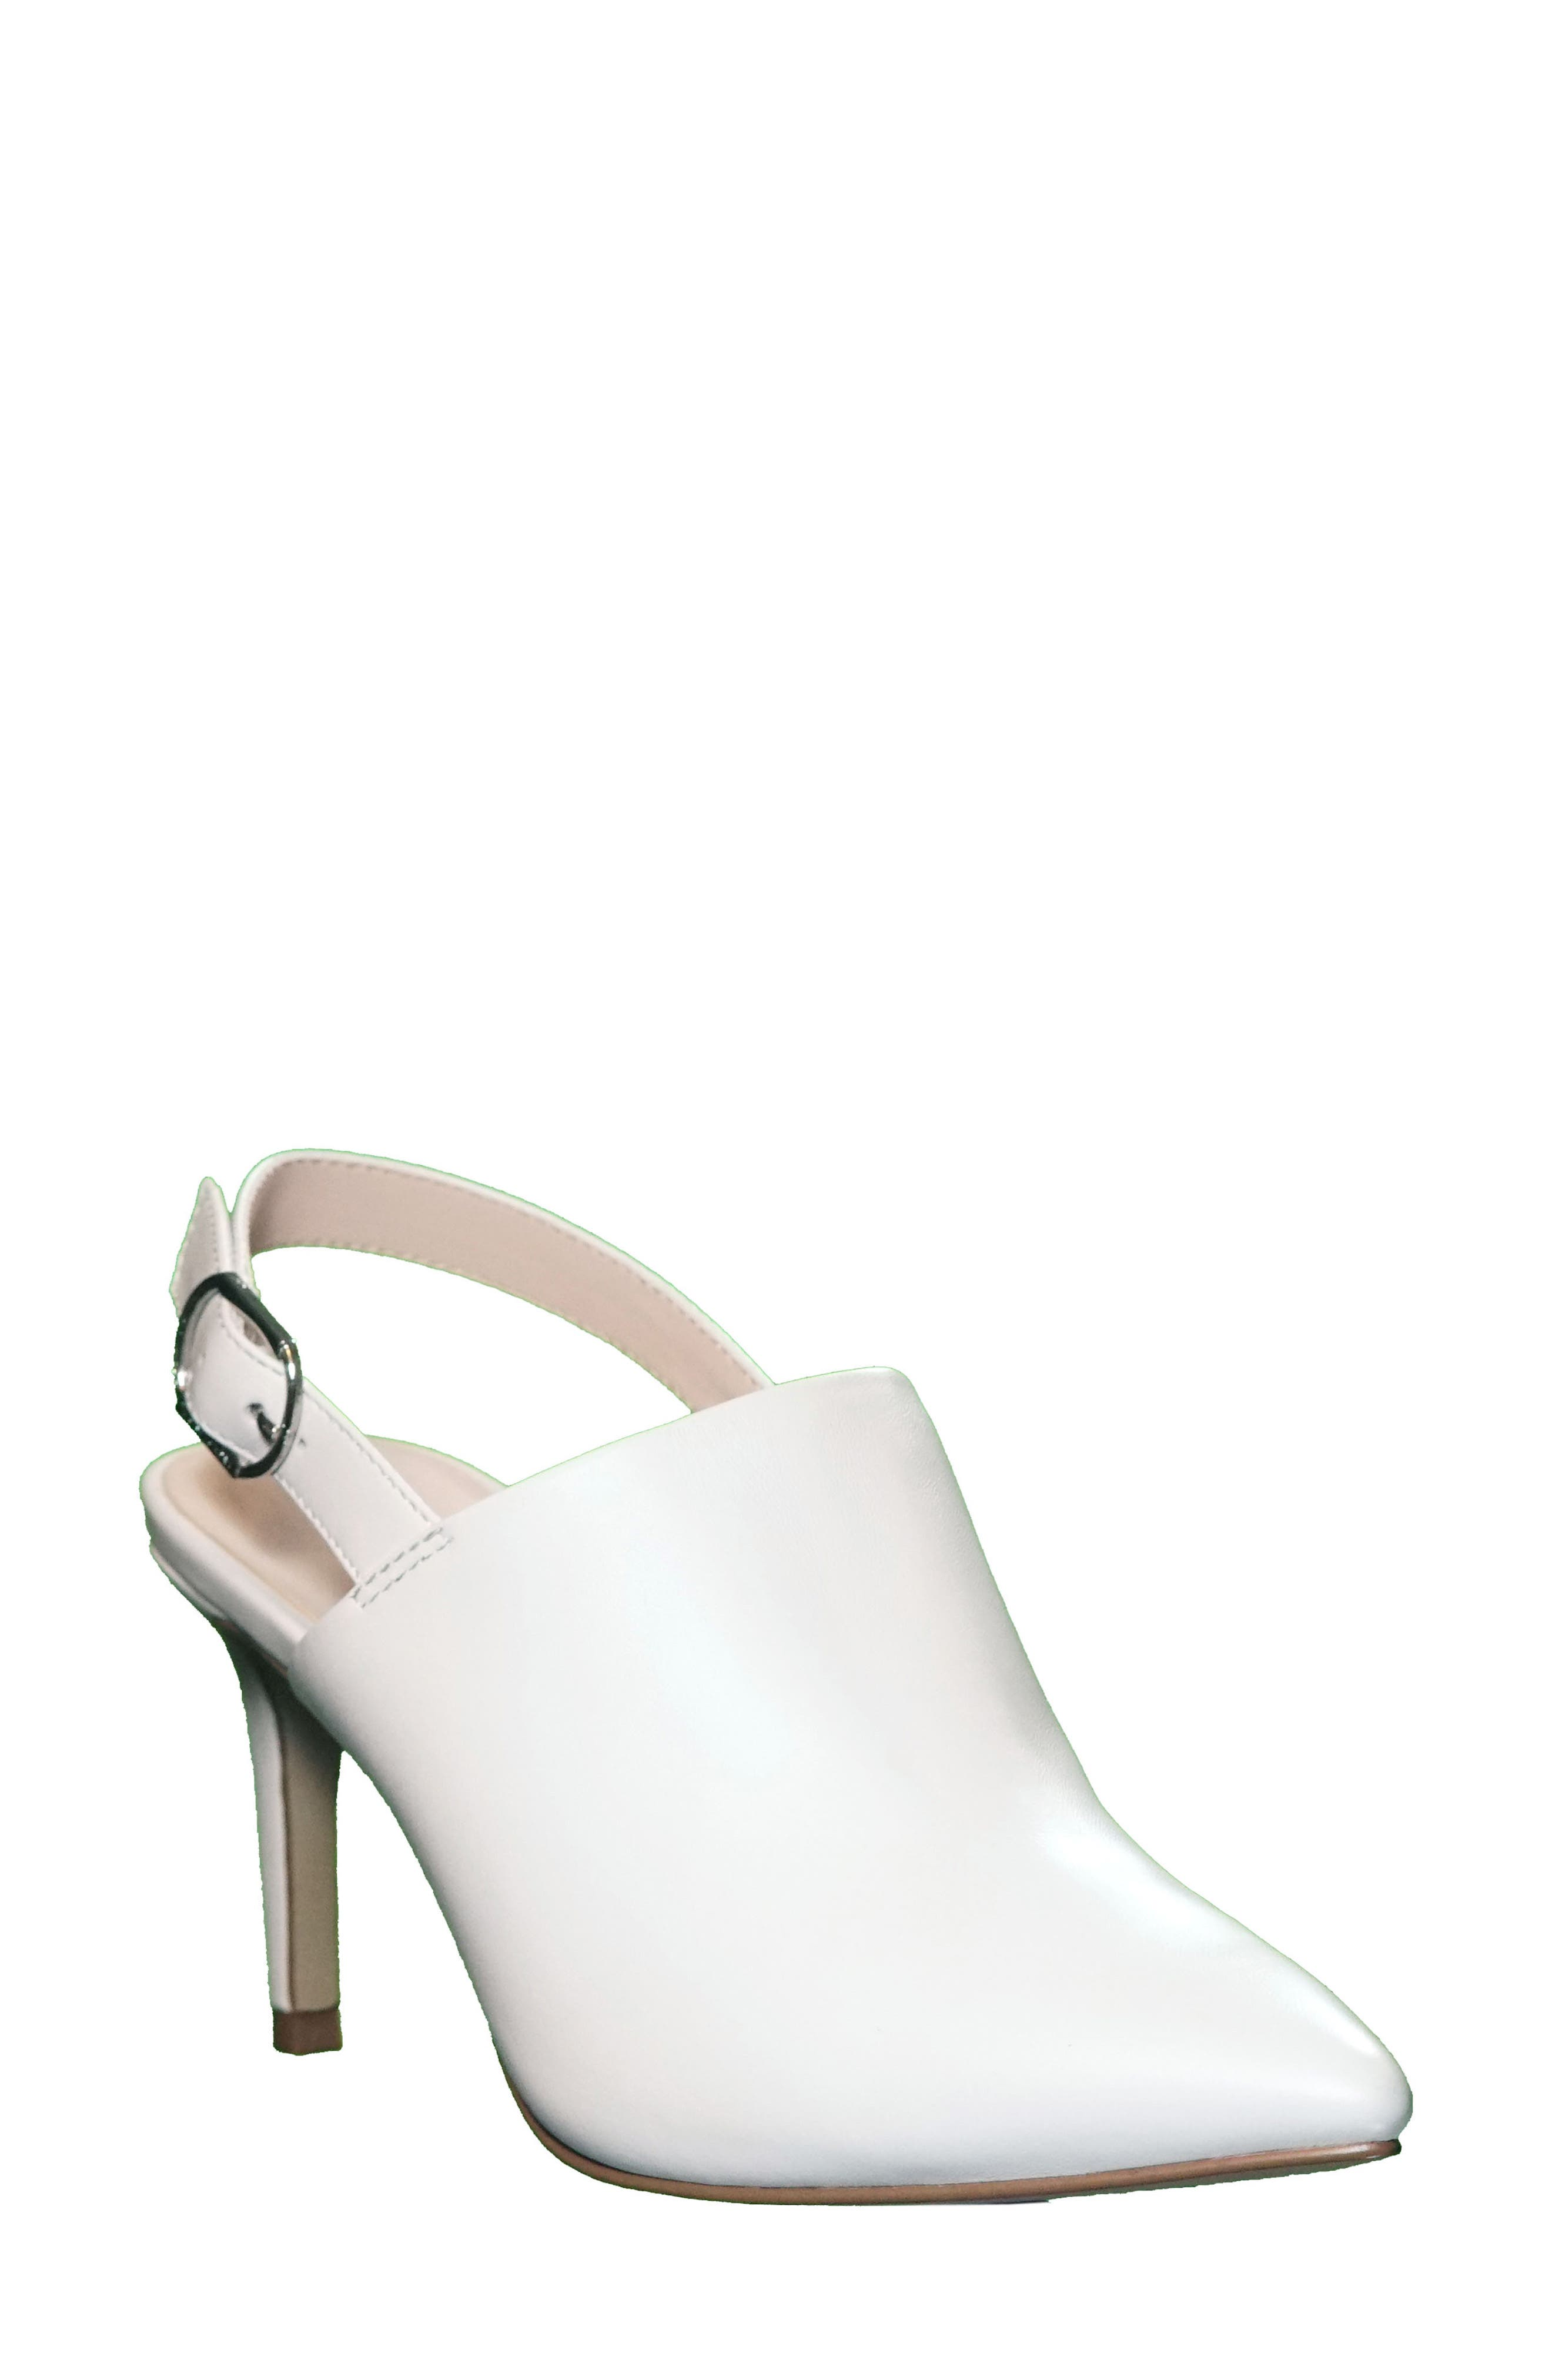 Tahari Pierrette Slingback Pump, White